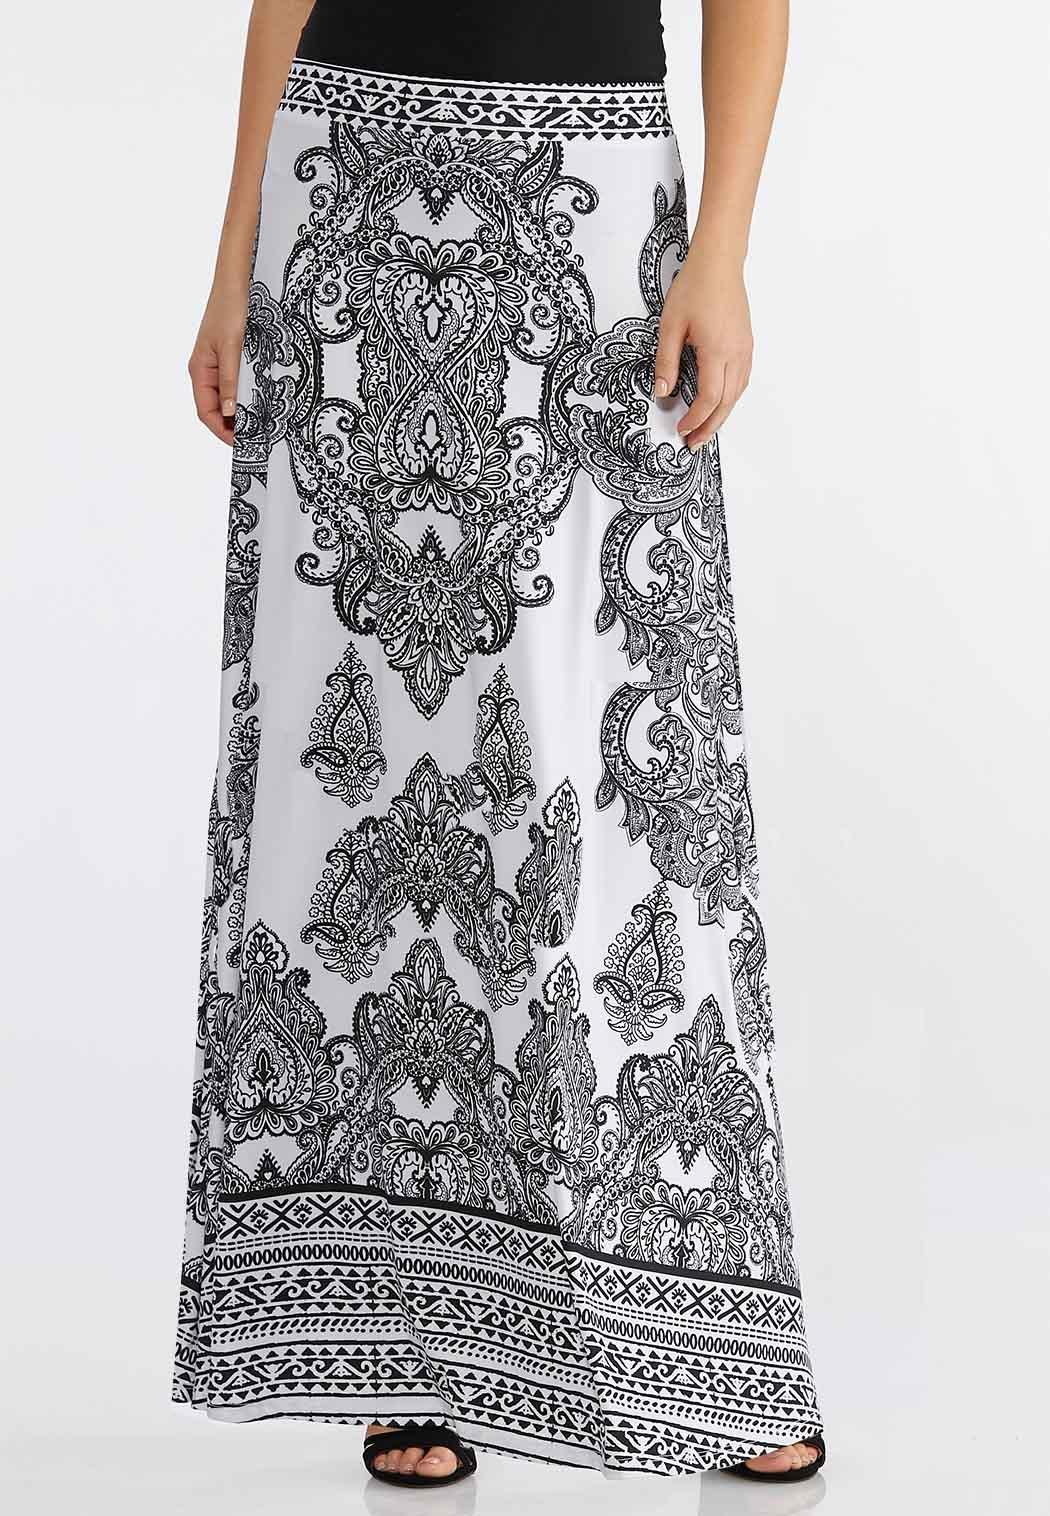 2722e88ef02 Plus Size Black And White Maxi Skirt Maxi Cato Fashions